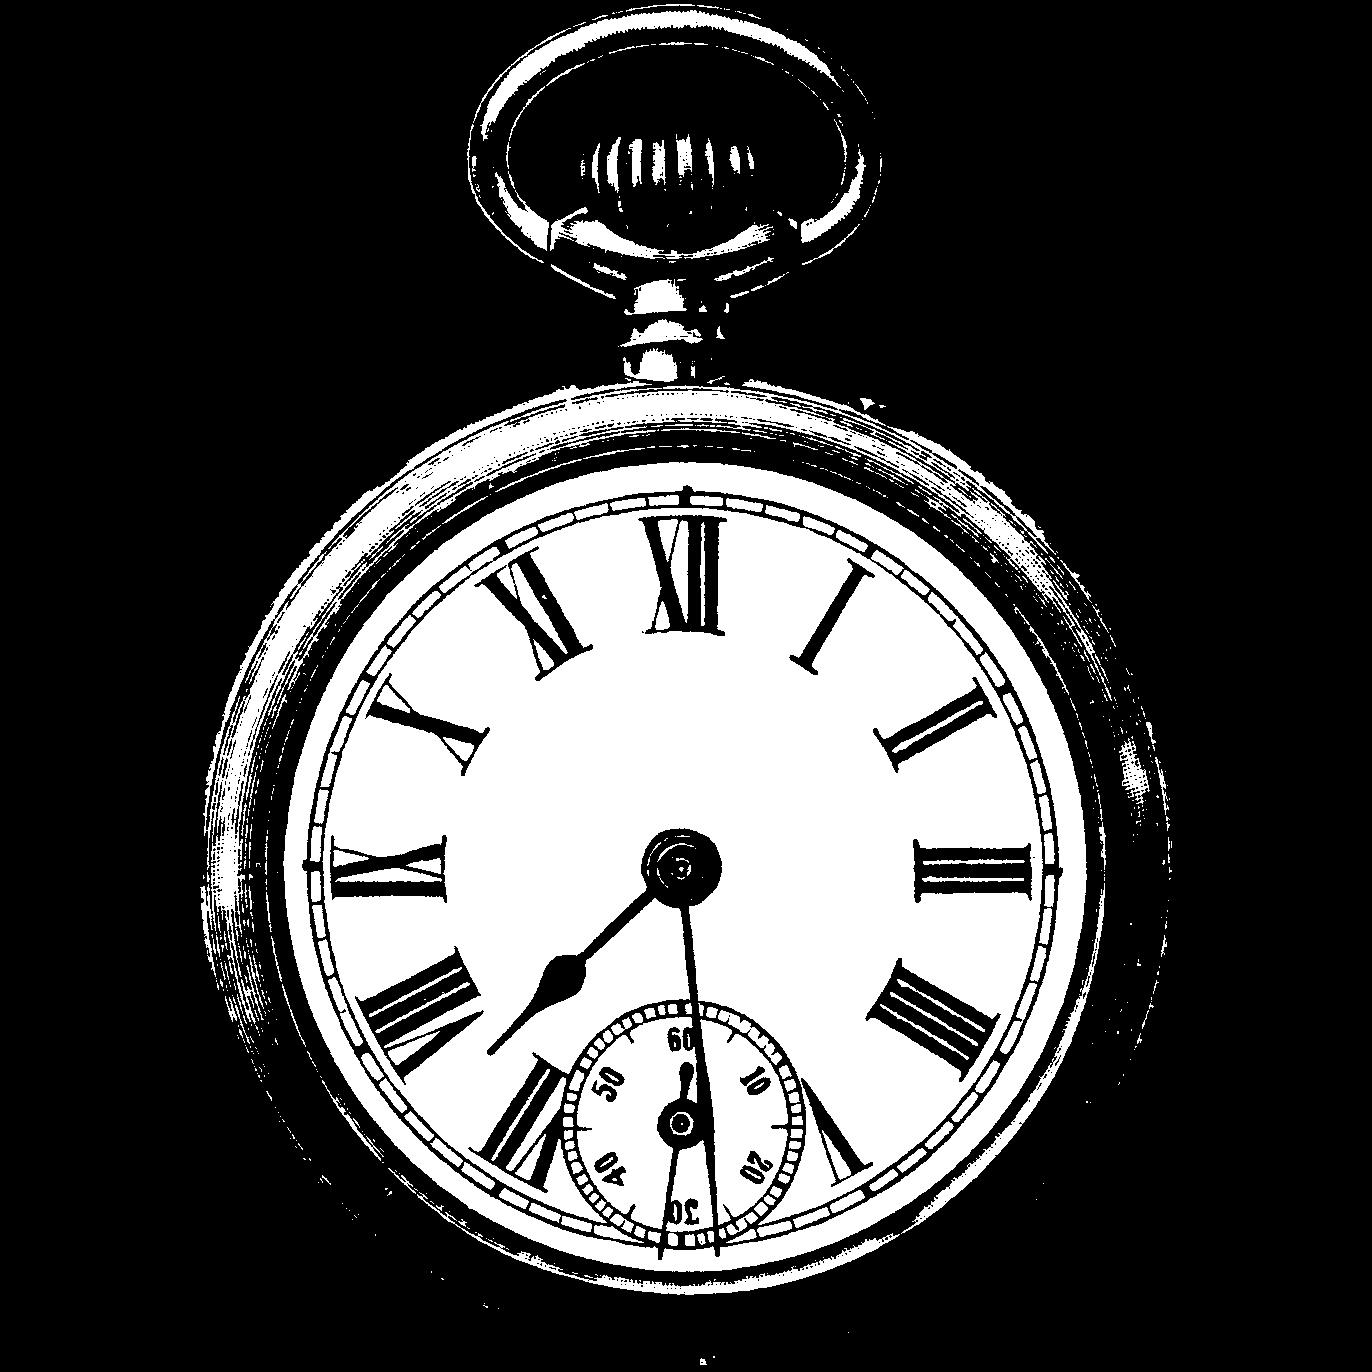 1372x1372 Old Clocks Drawings